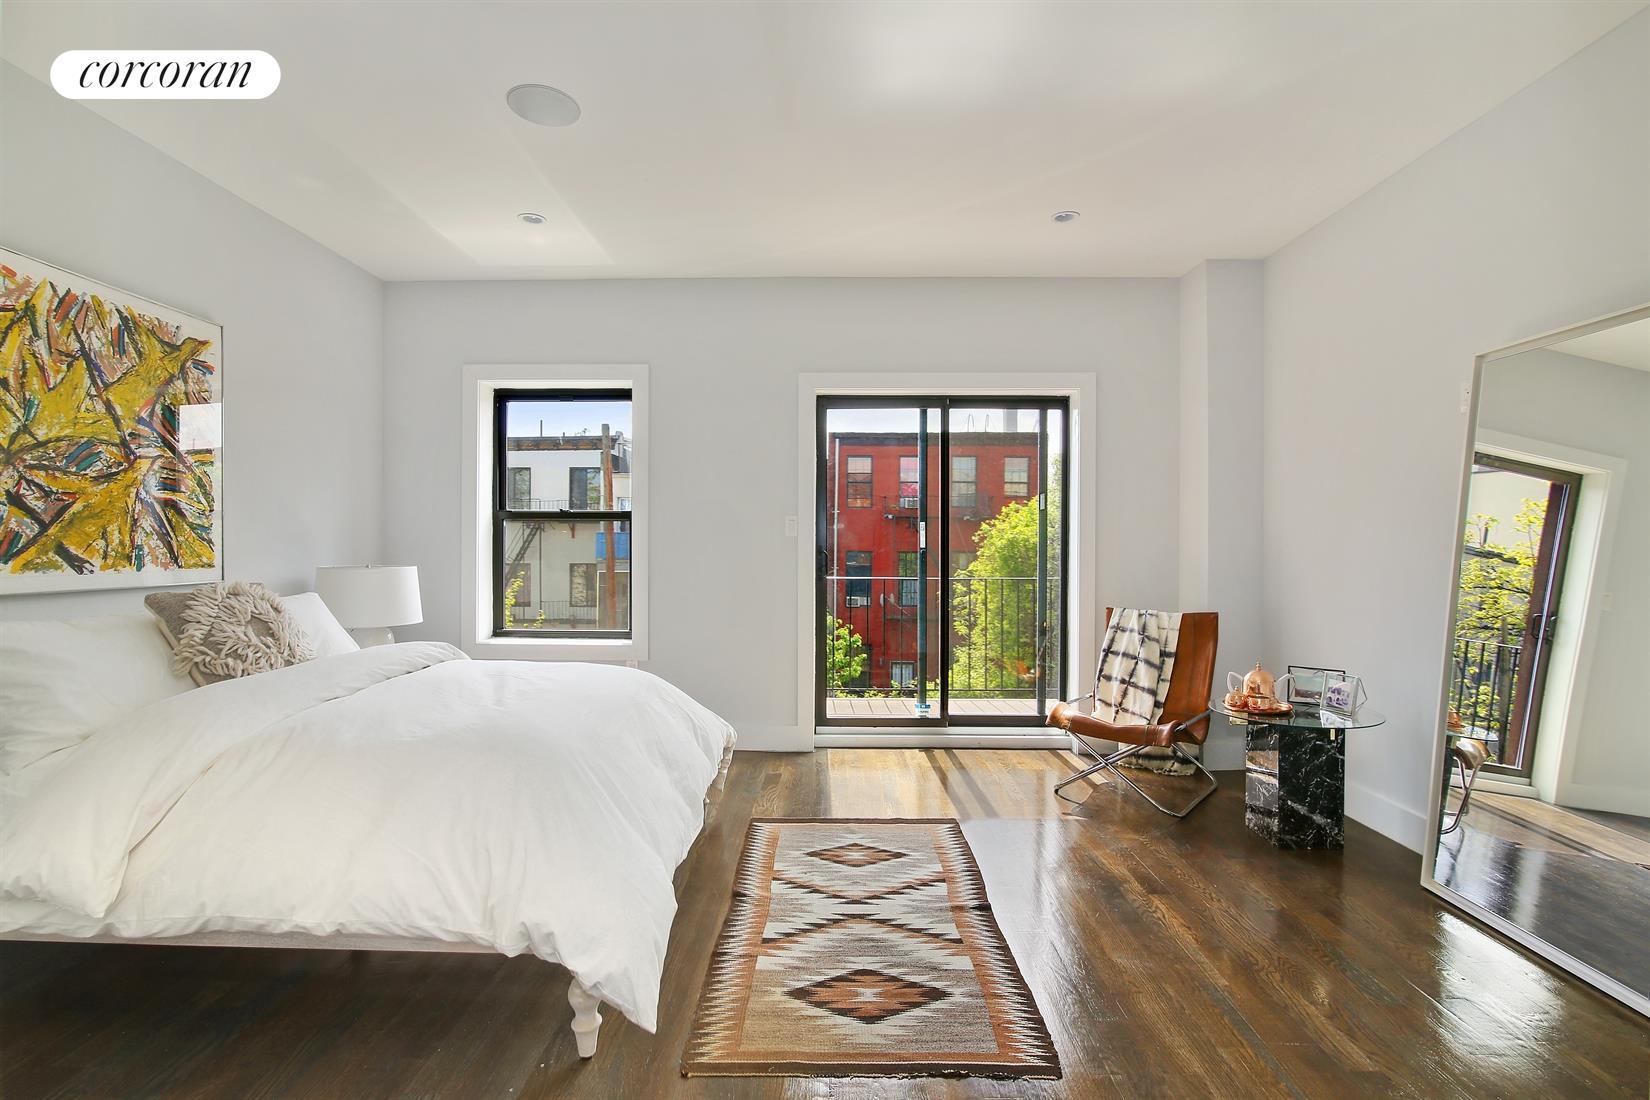 Corcoran, 52 Harman Street, Bushwick Real Estate, Brooklyn For Sale ...